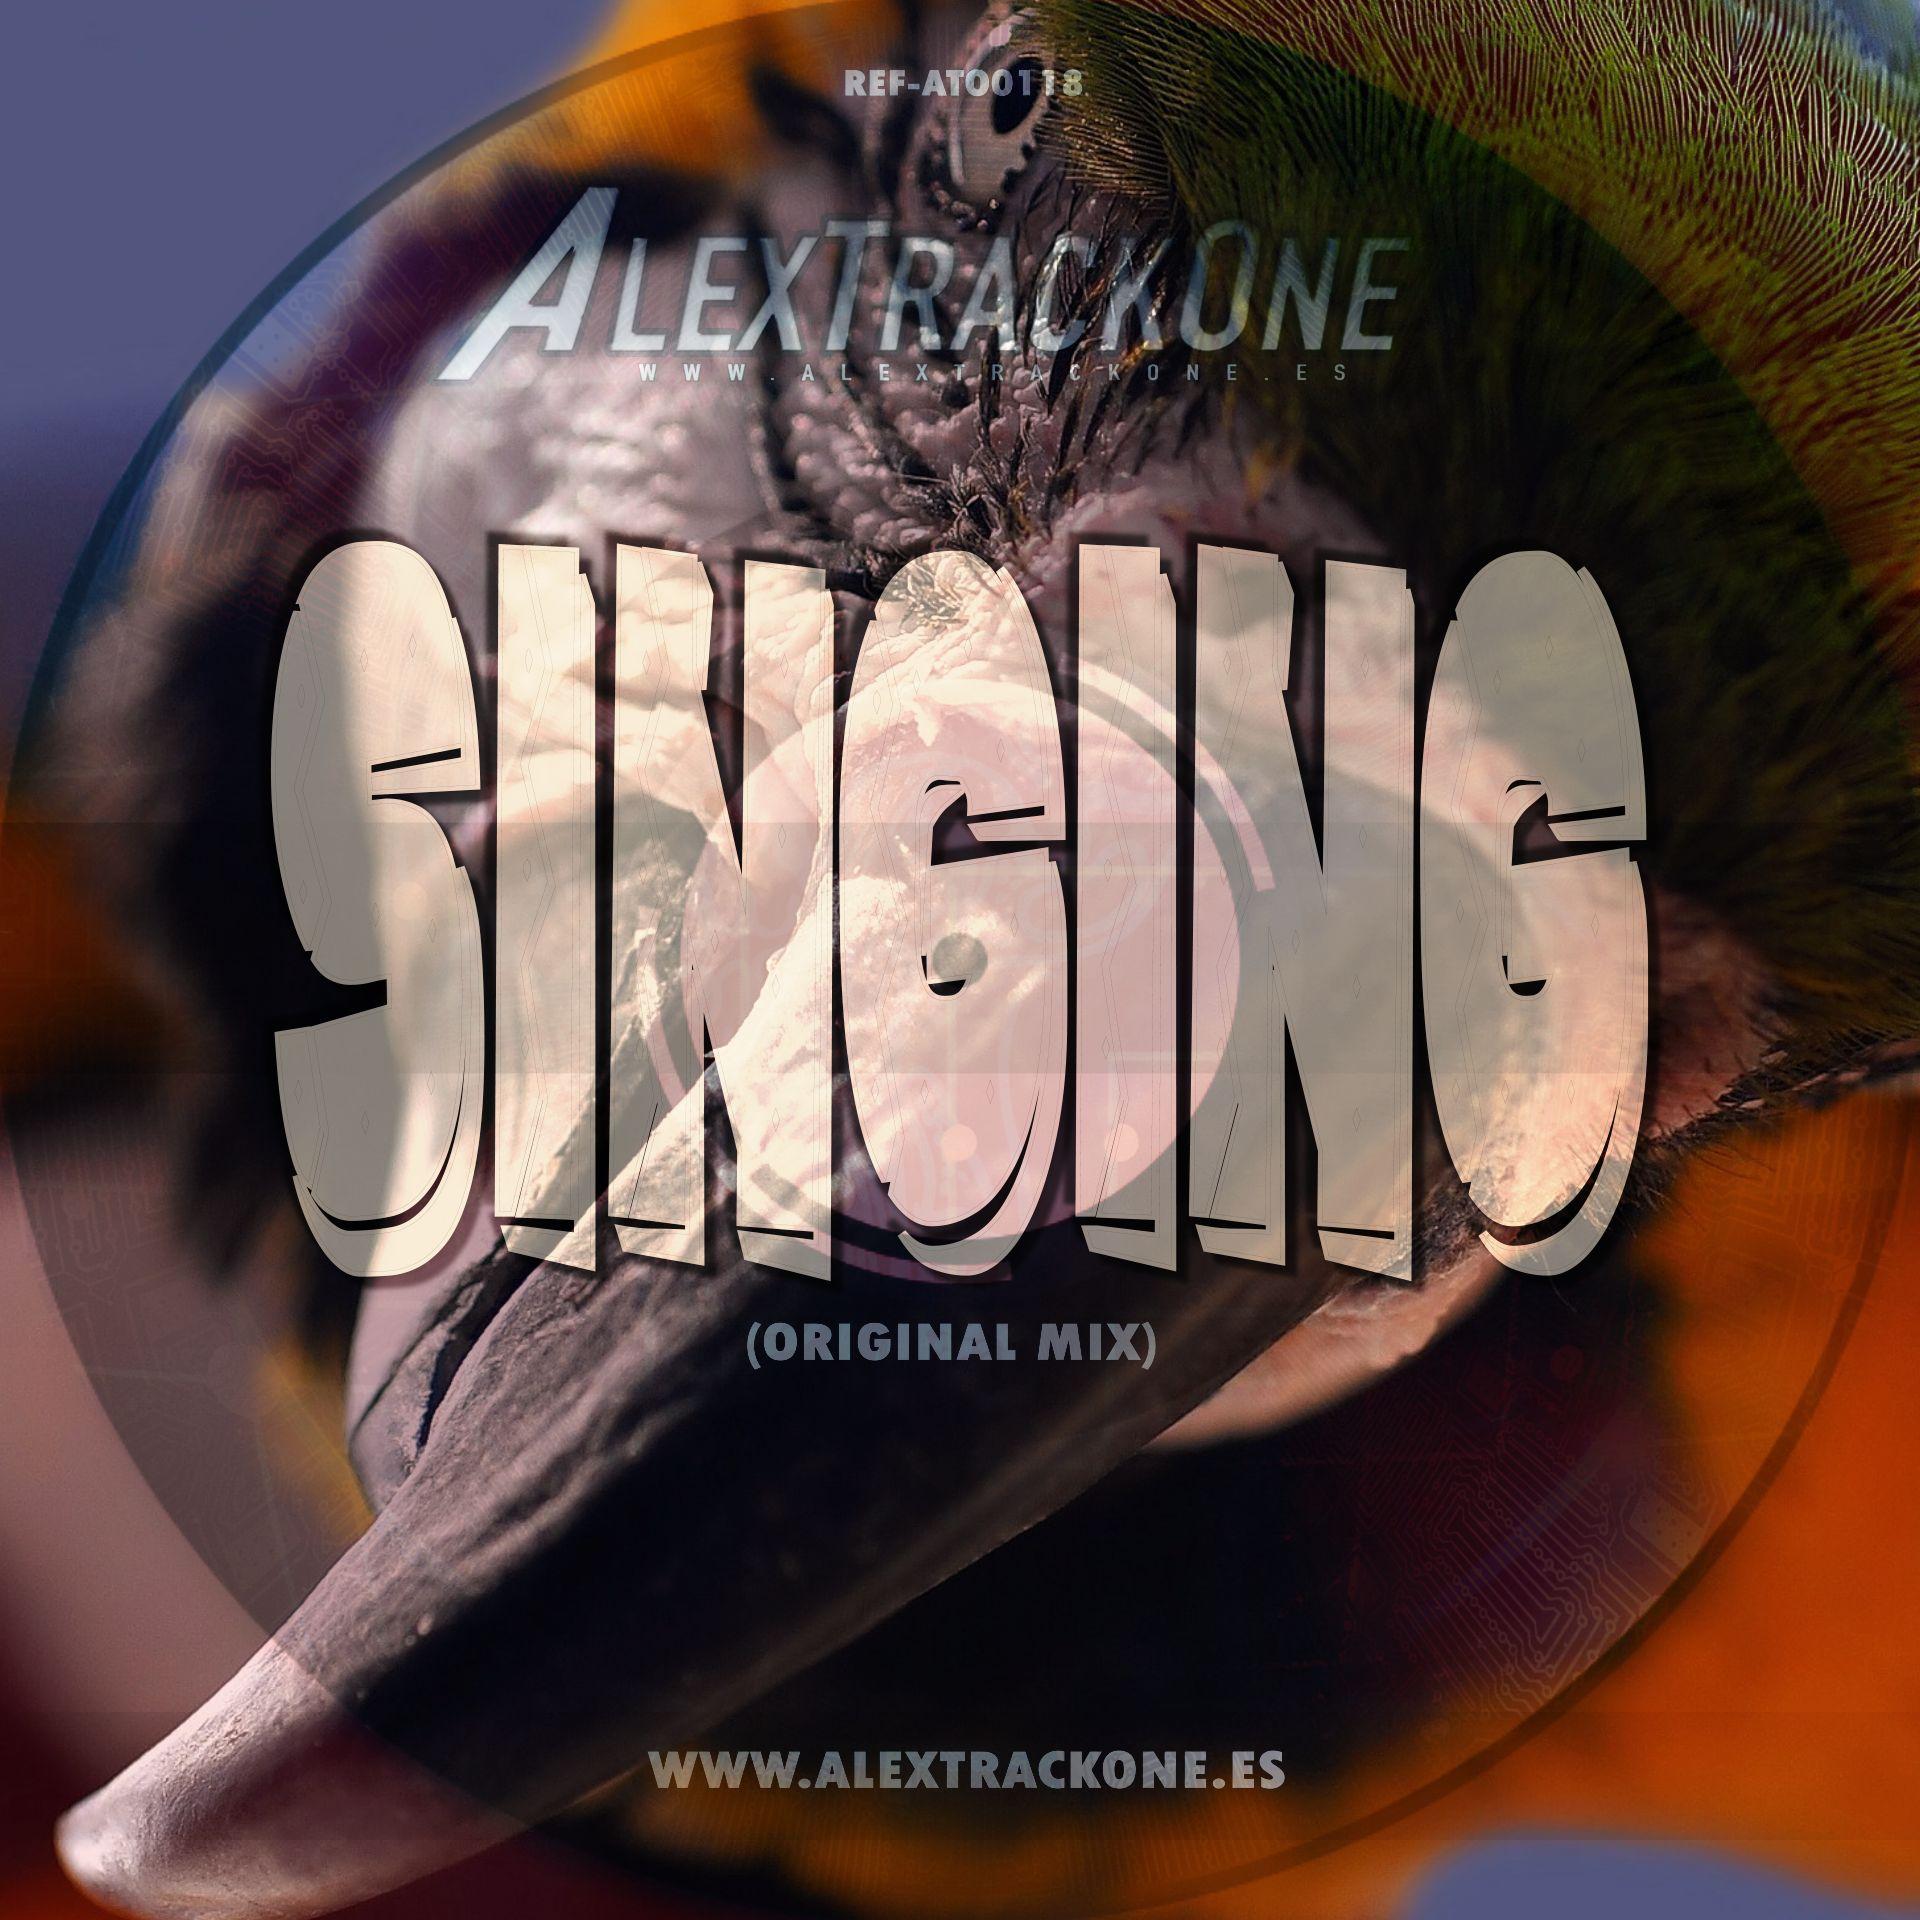 REF-ATO0118 SINGING (ORIGINAL MIX) (MP3 & WAV & FLAC)